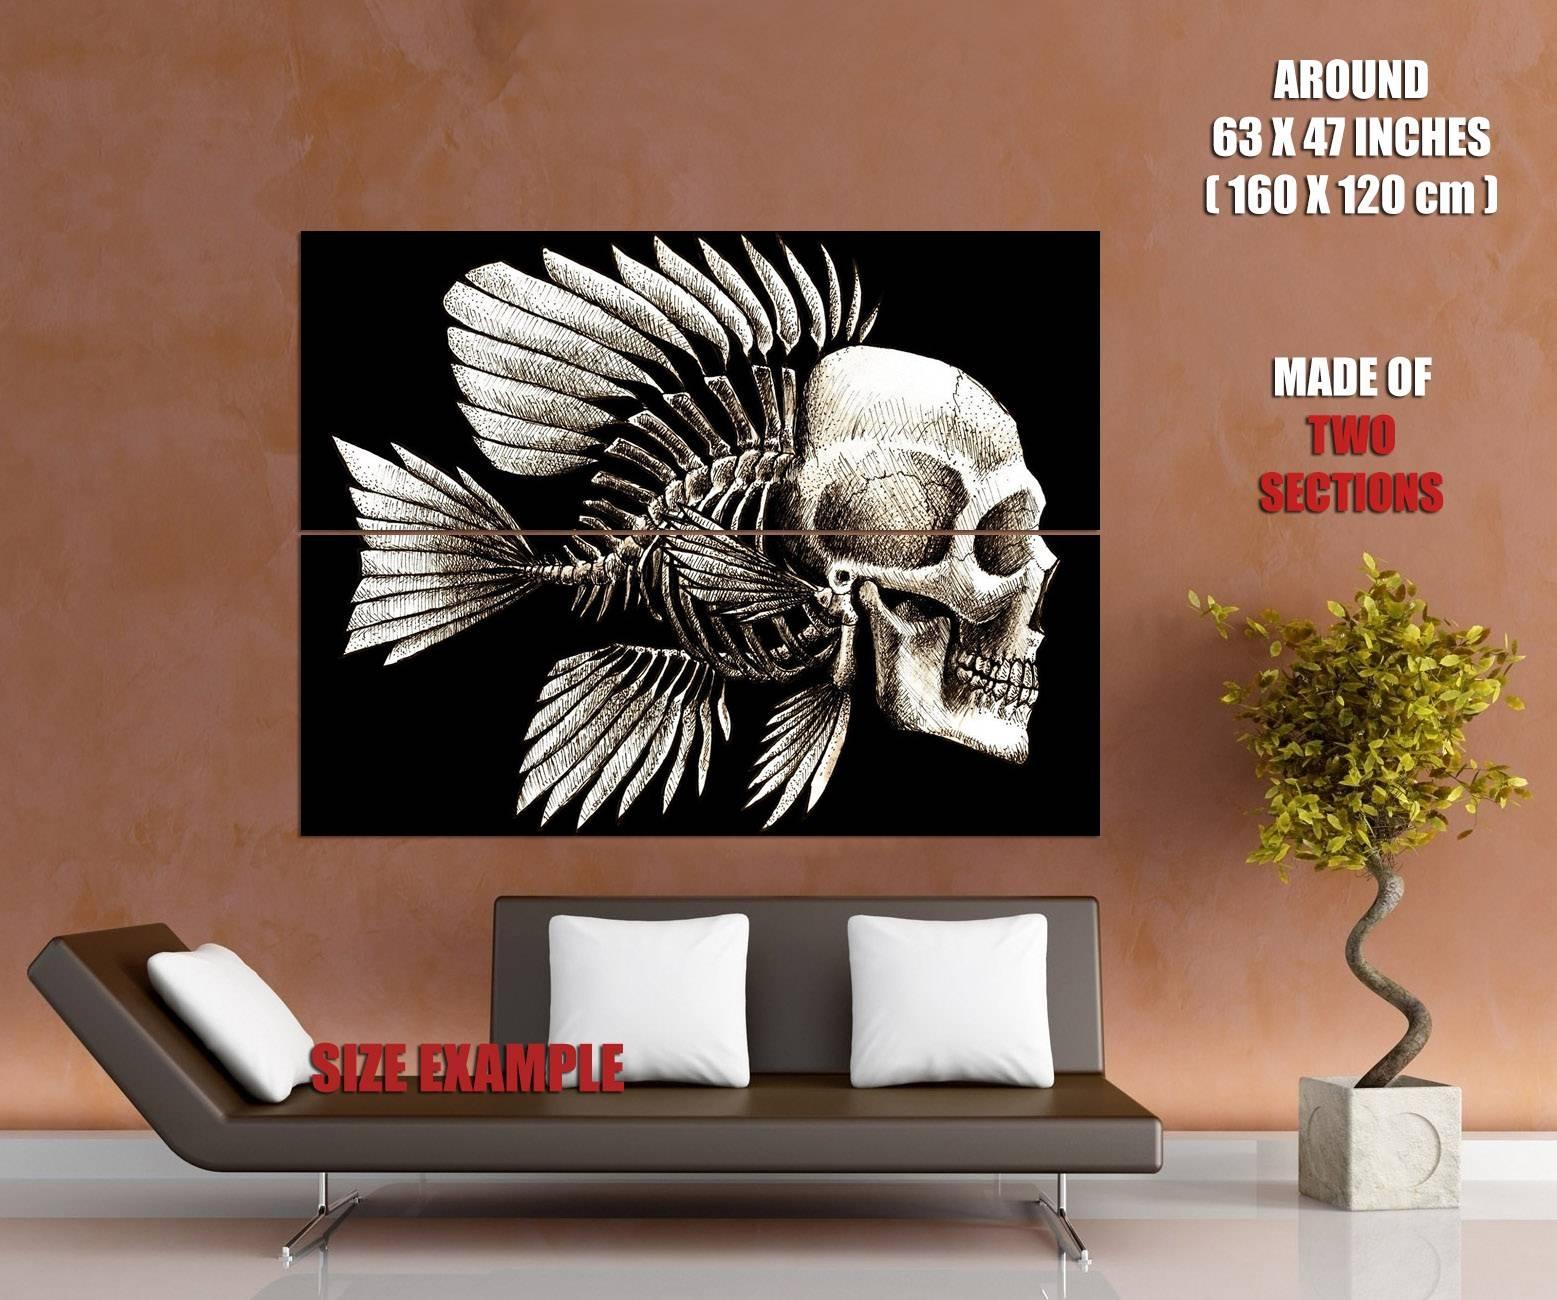 Skull Fish Bone Creative Art Wall Print Poster | Ebay Within 2018 Fish Bone Wall Art (View 19 of 20)